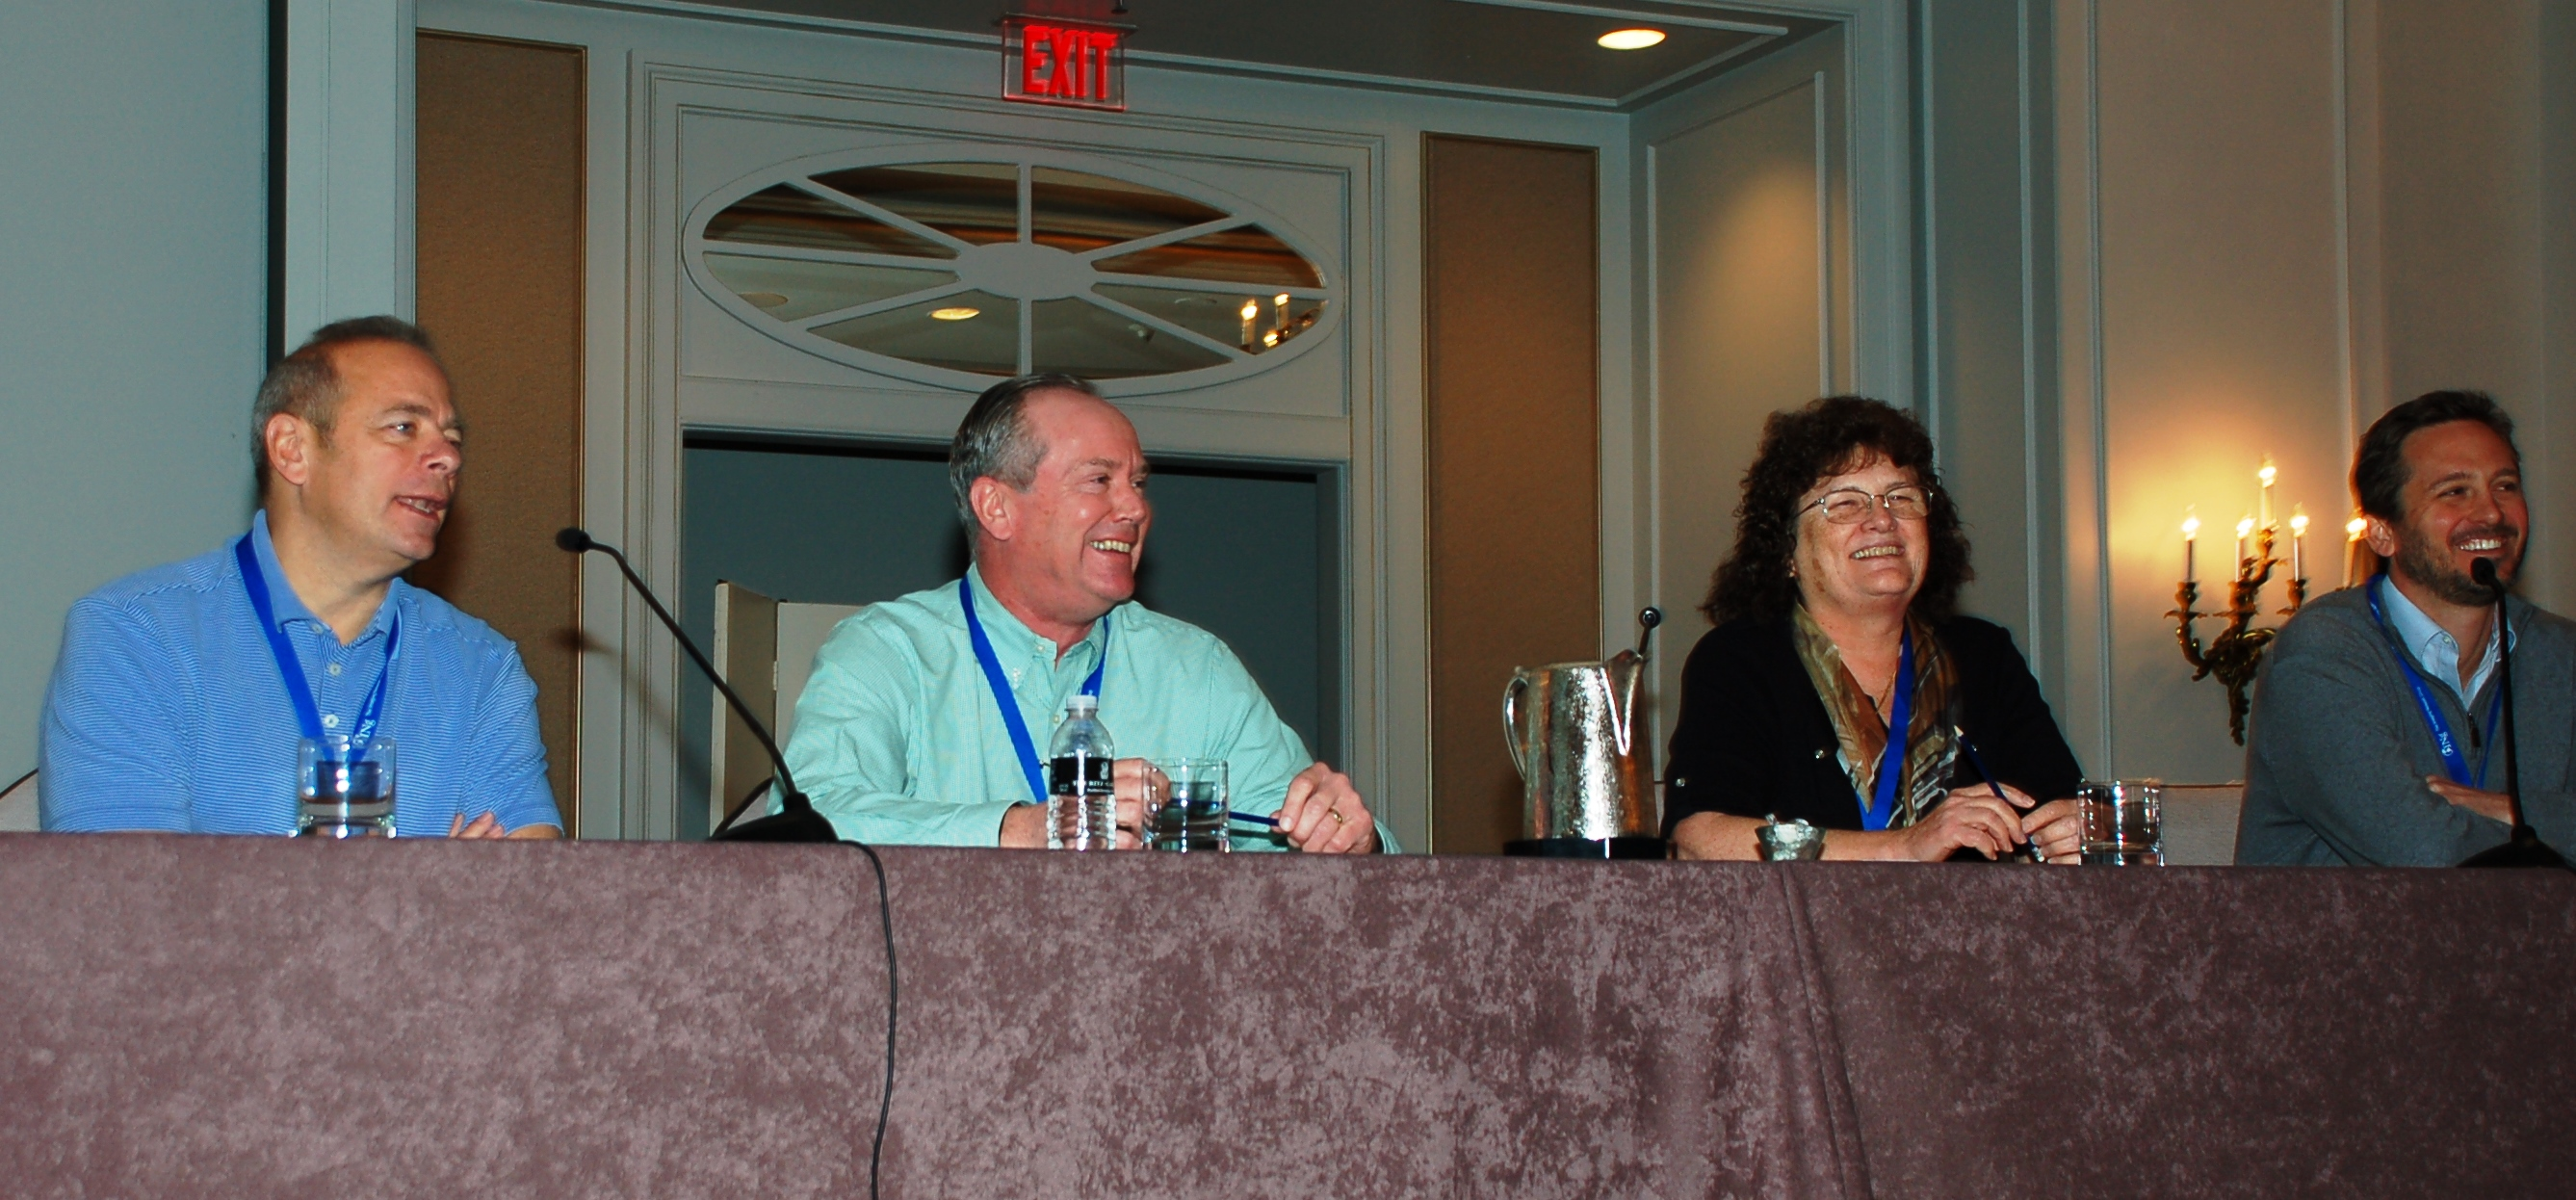 2016 forum panel RFP